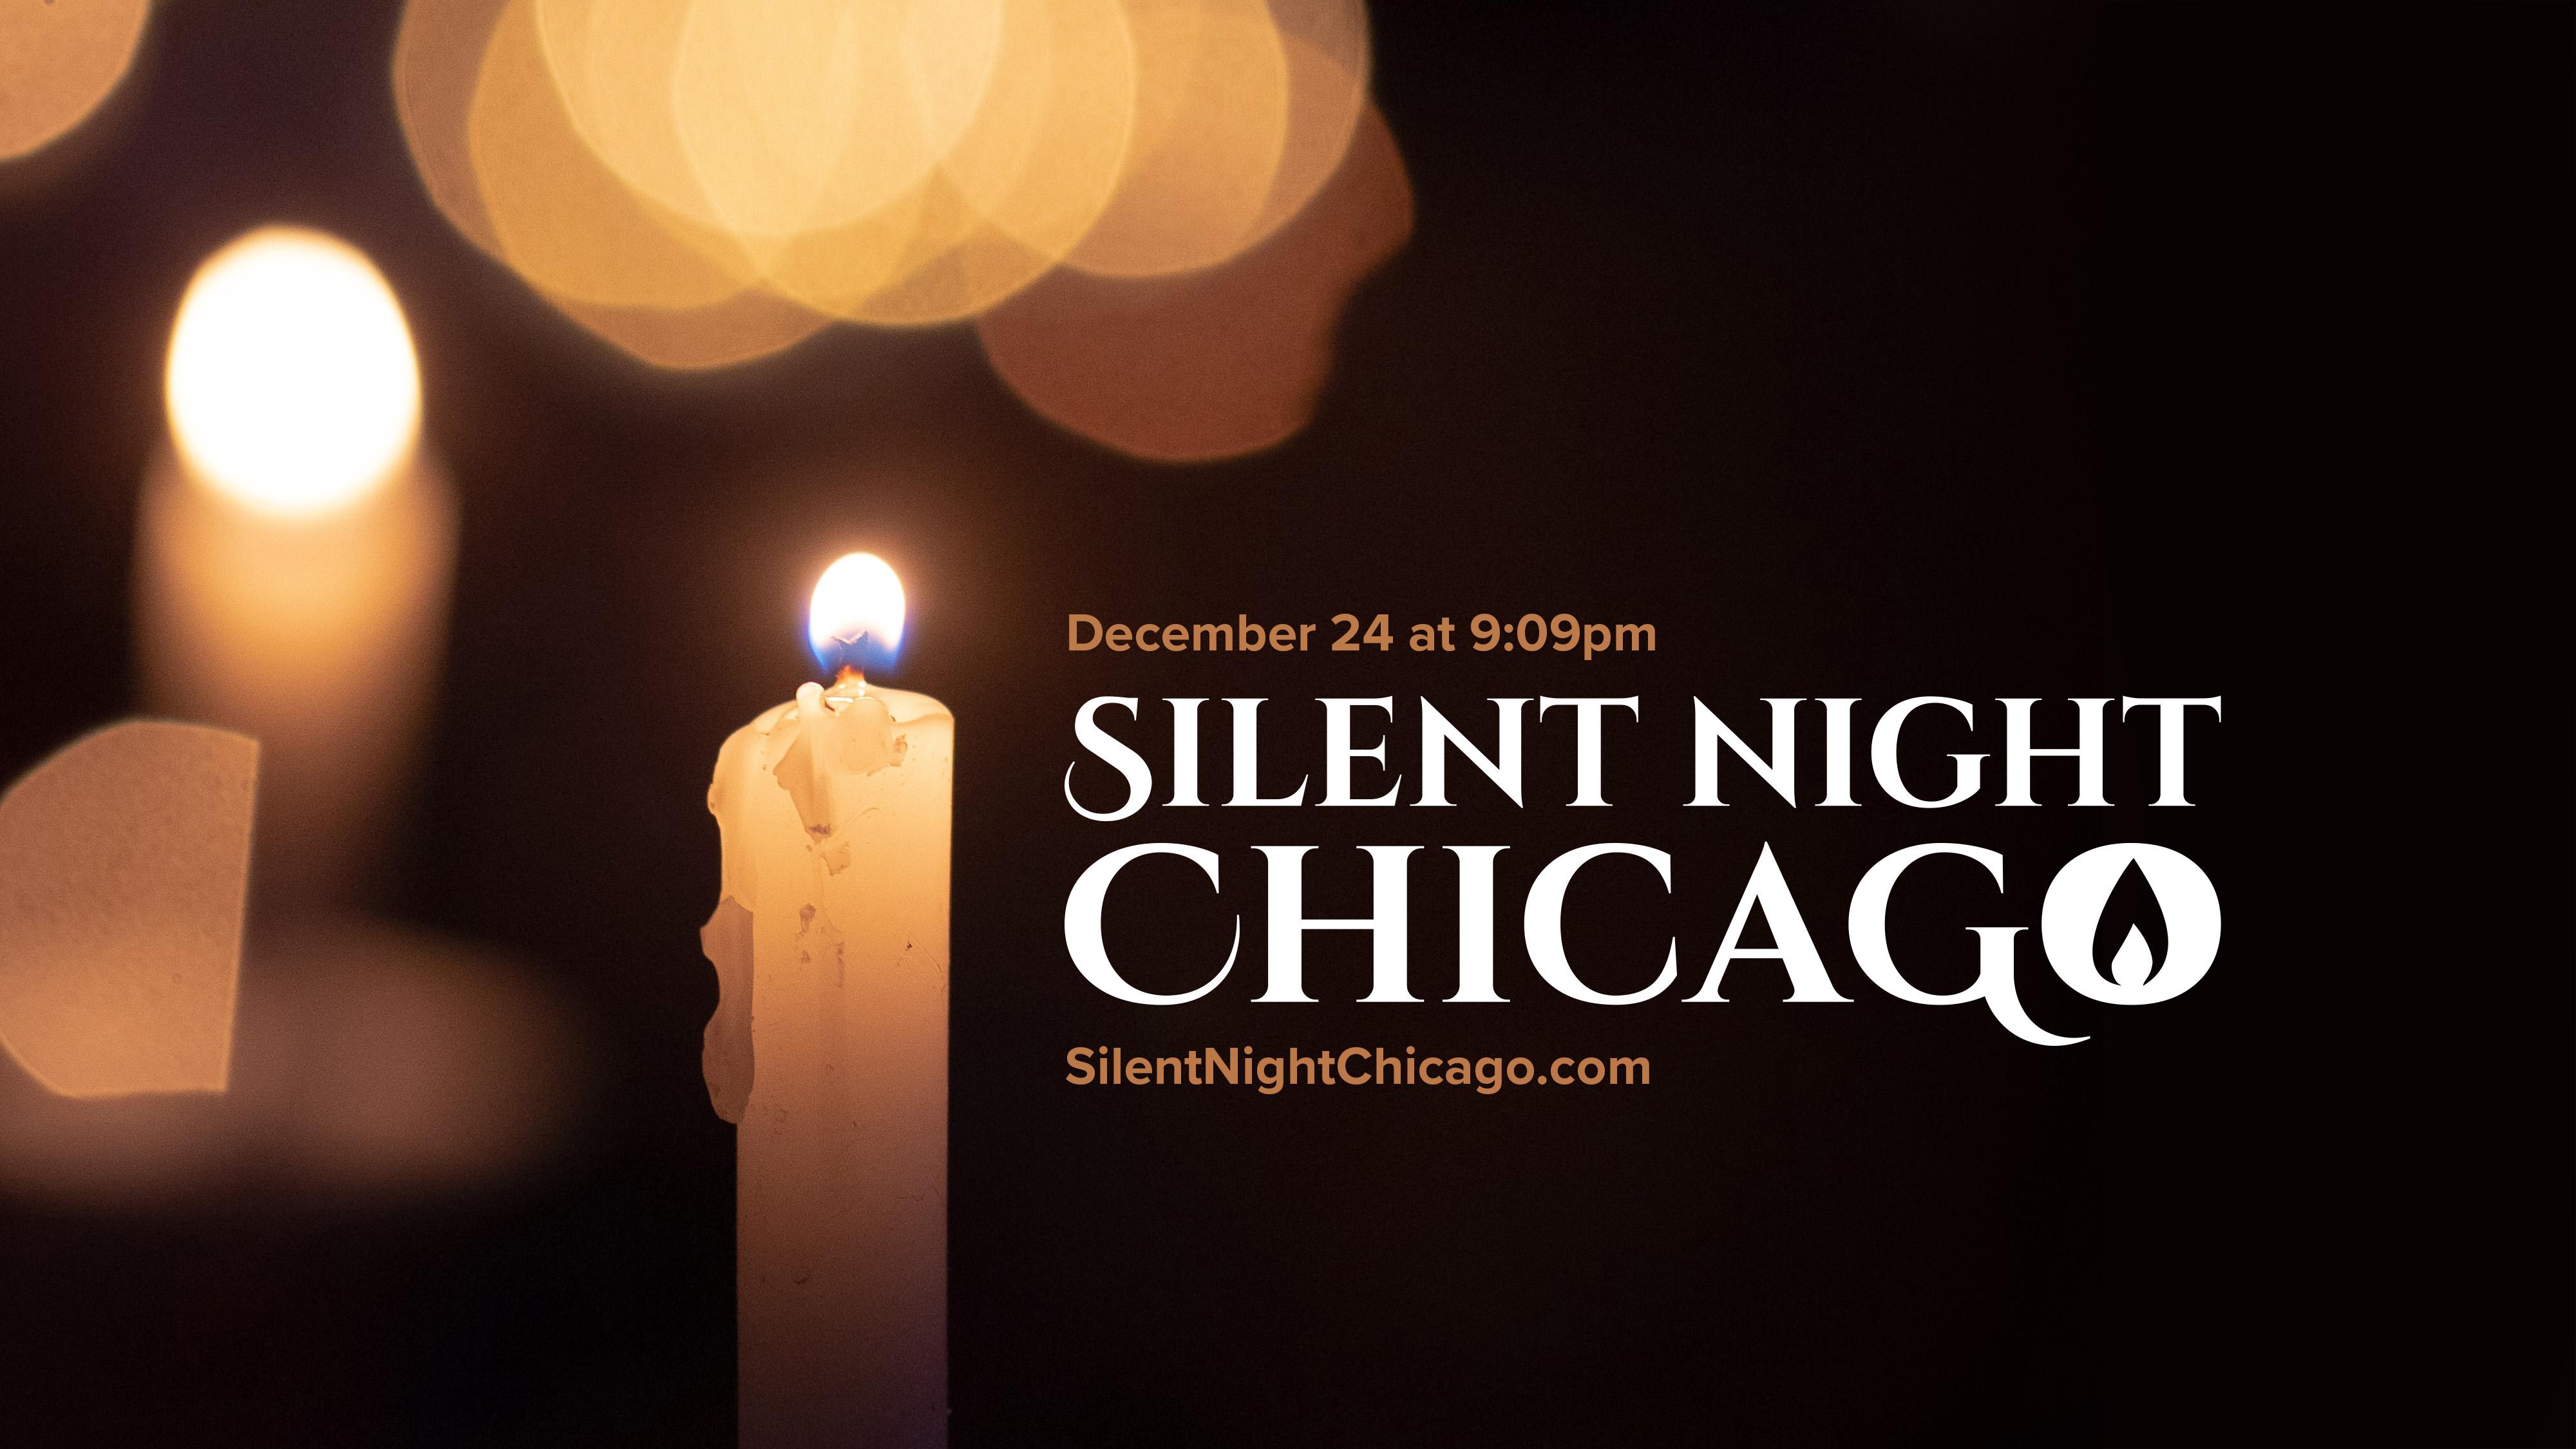 Silent Night Chicago